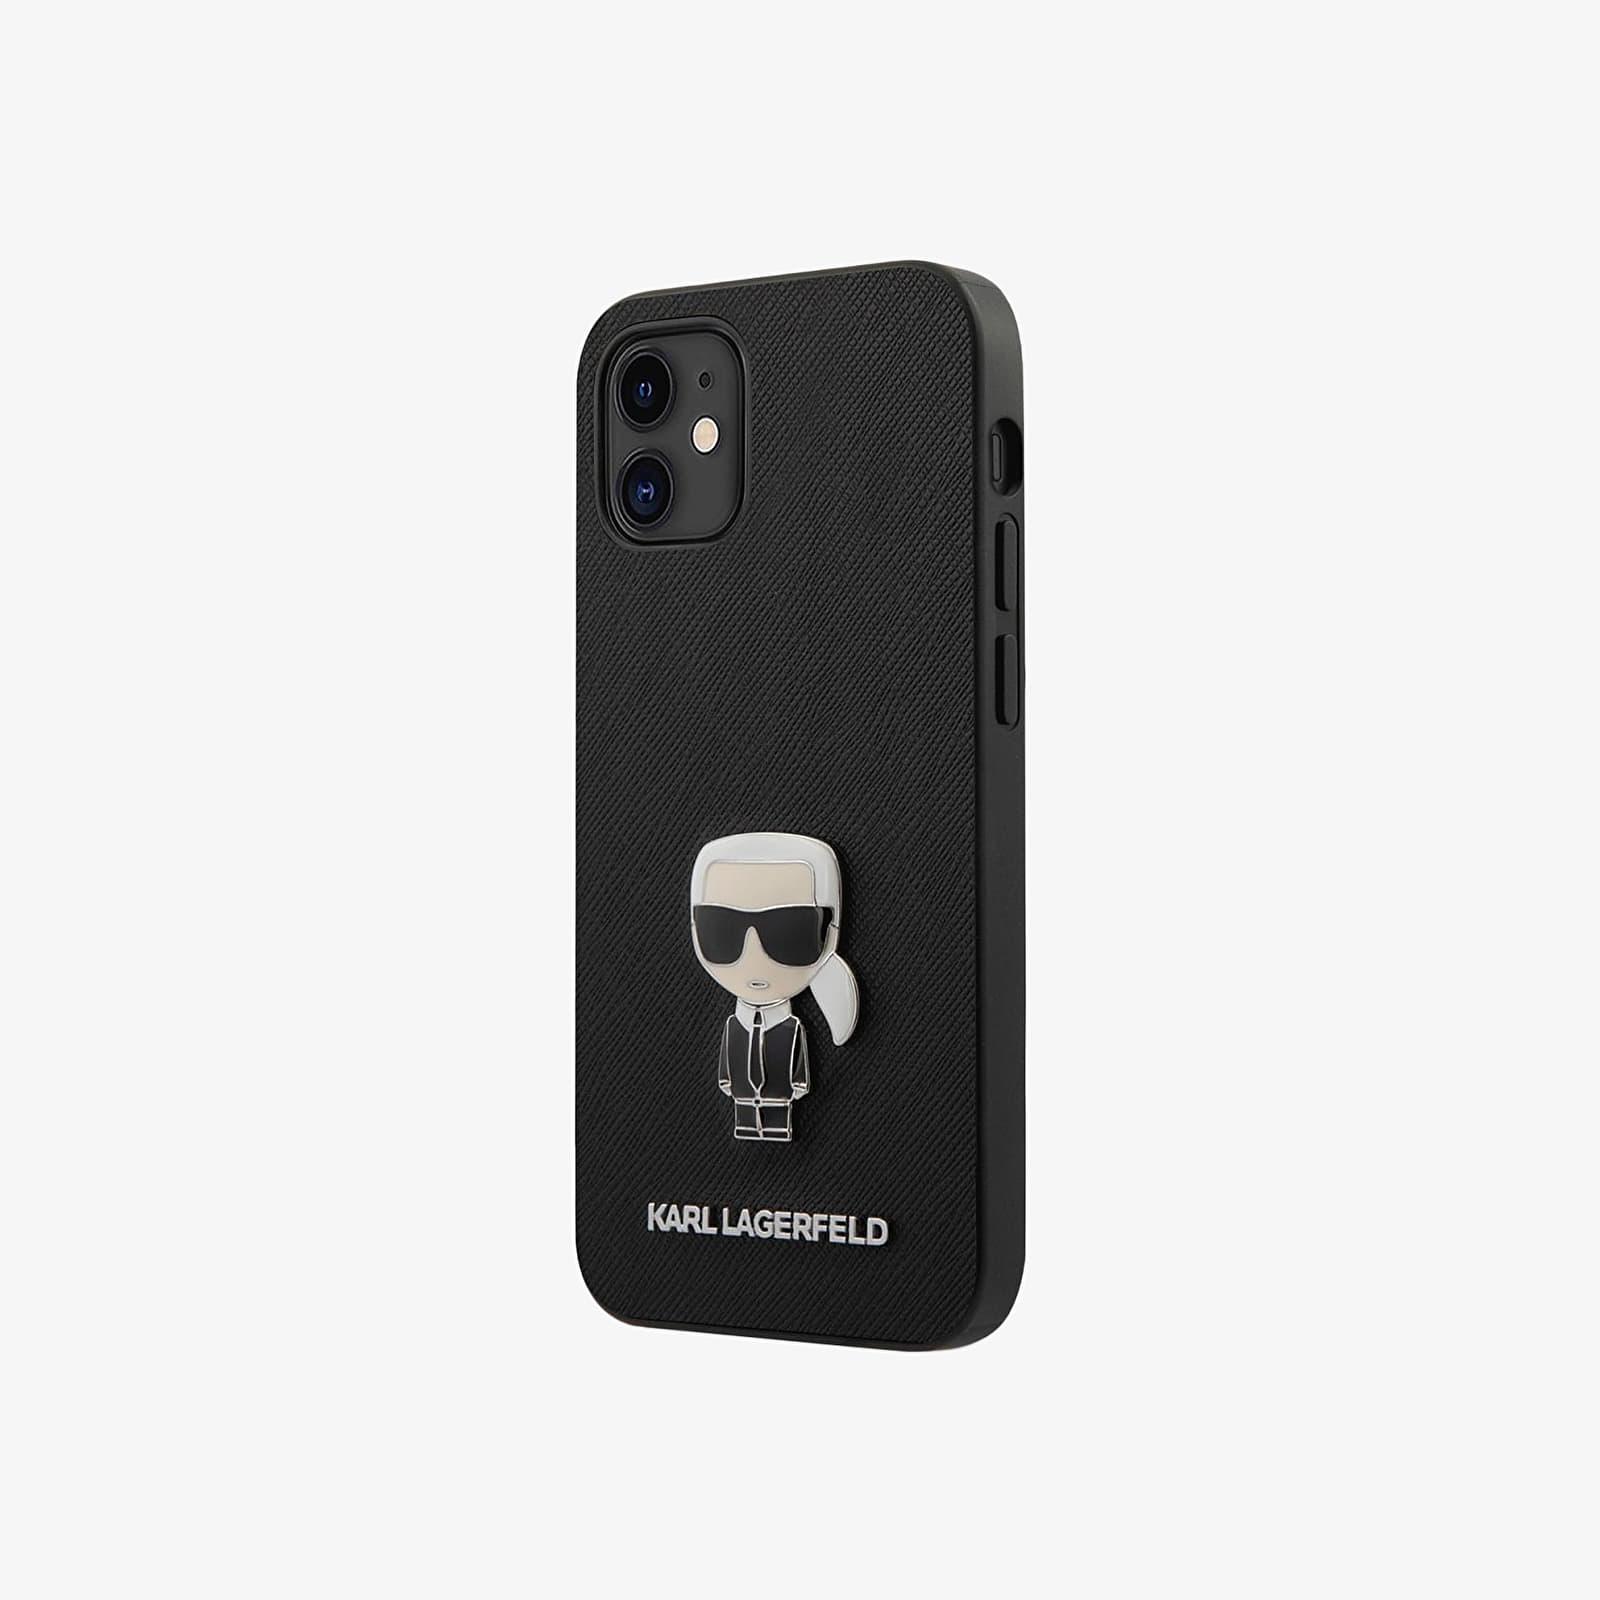 "Karl Lagerfeld Saffiano Iconic iPhone 12 Cover mini 5.4"" Black Universal"